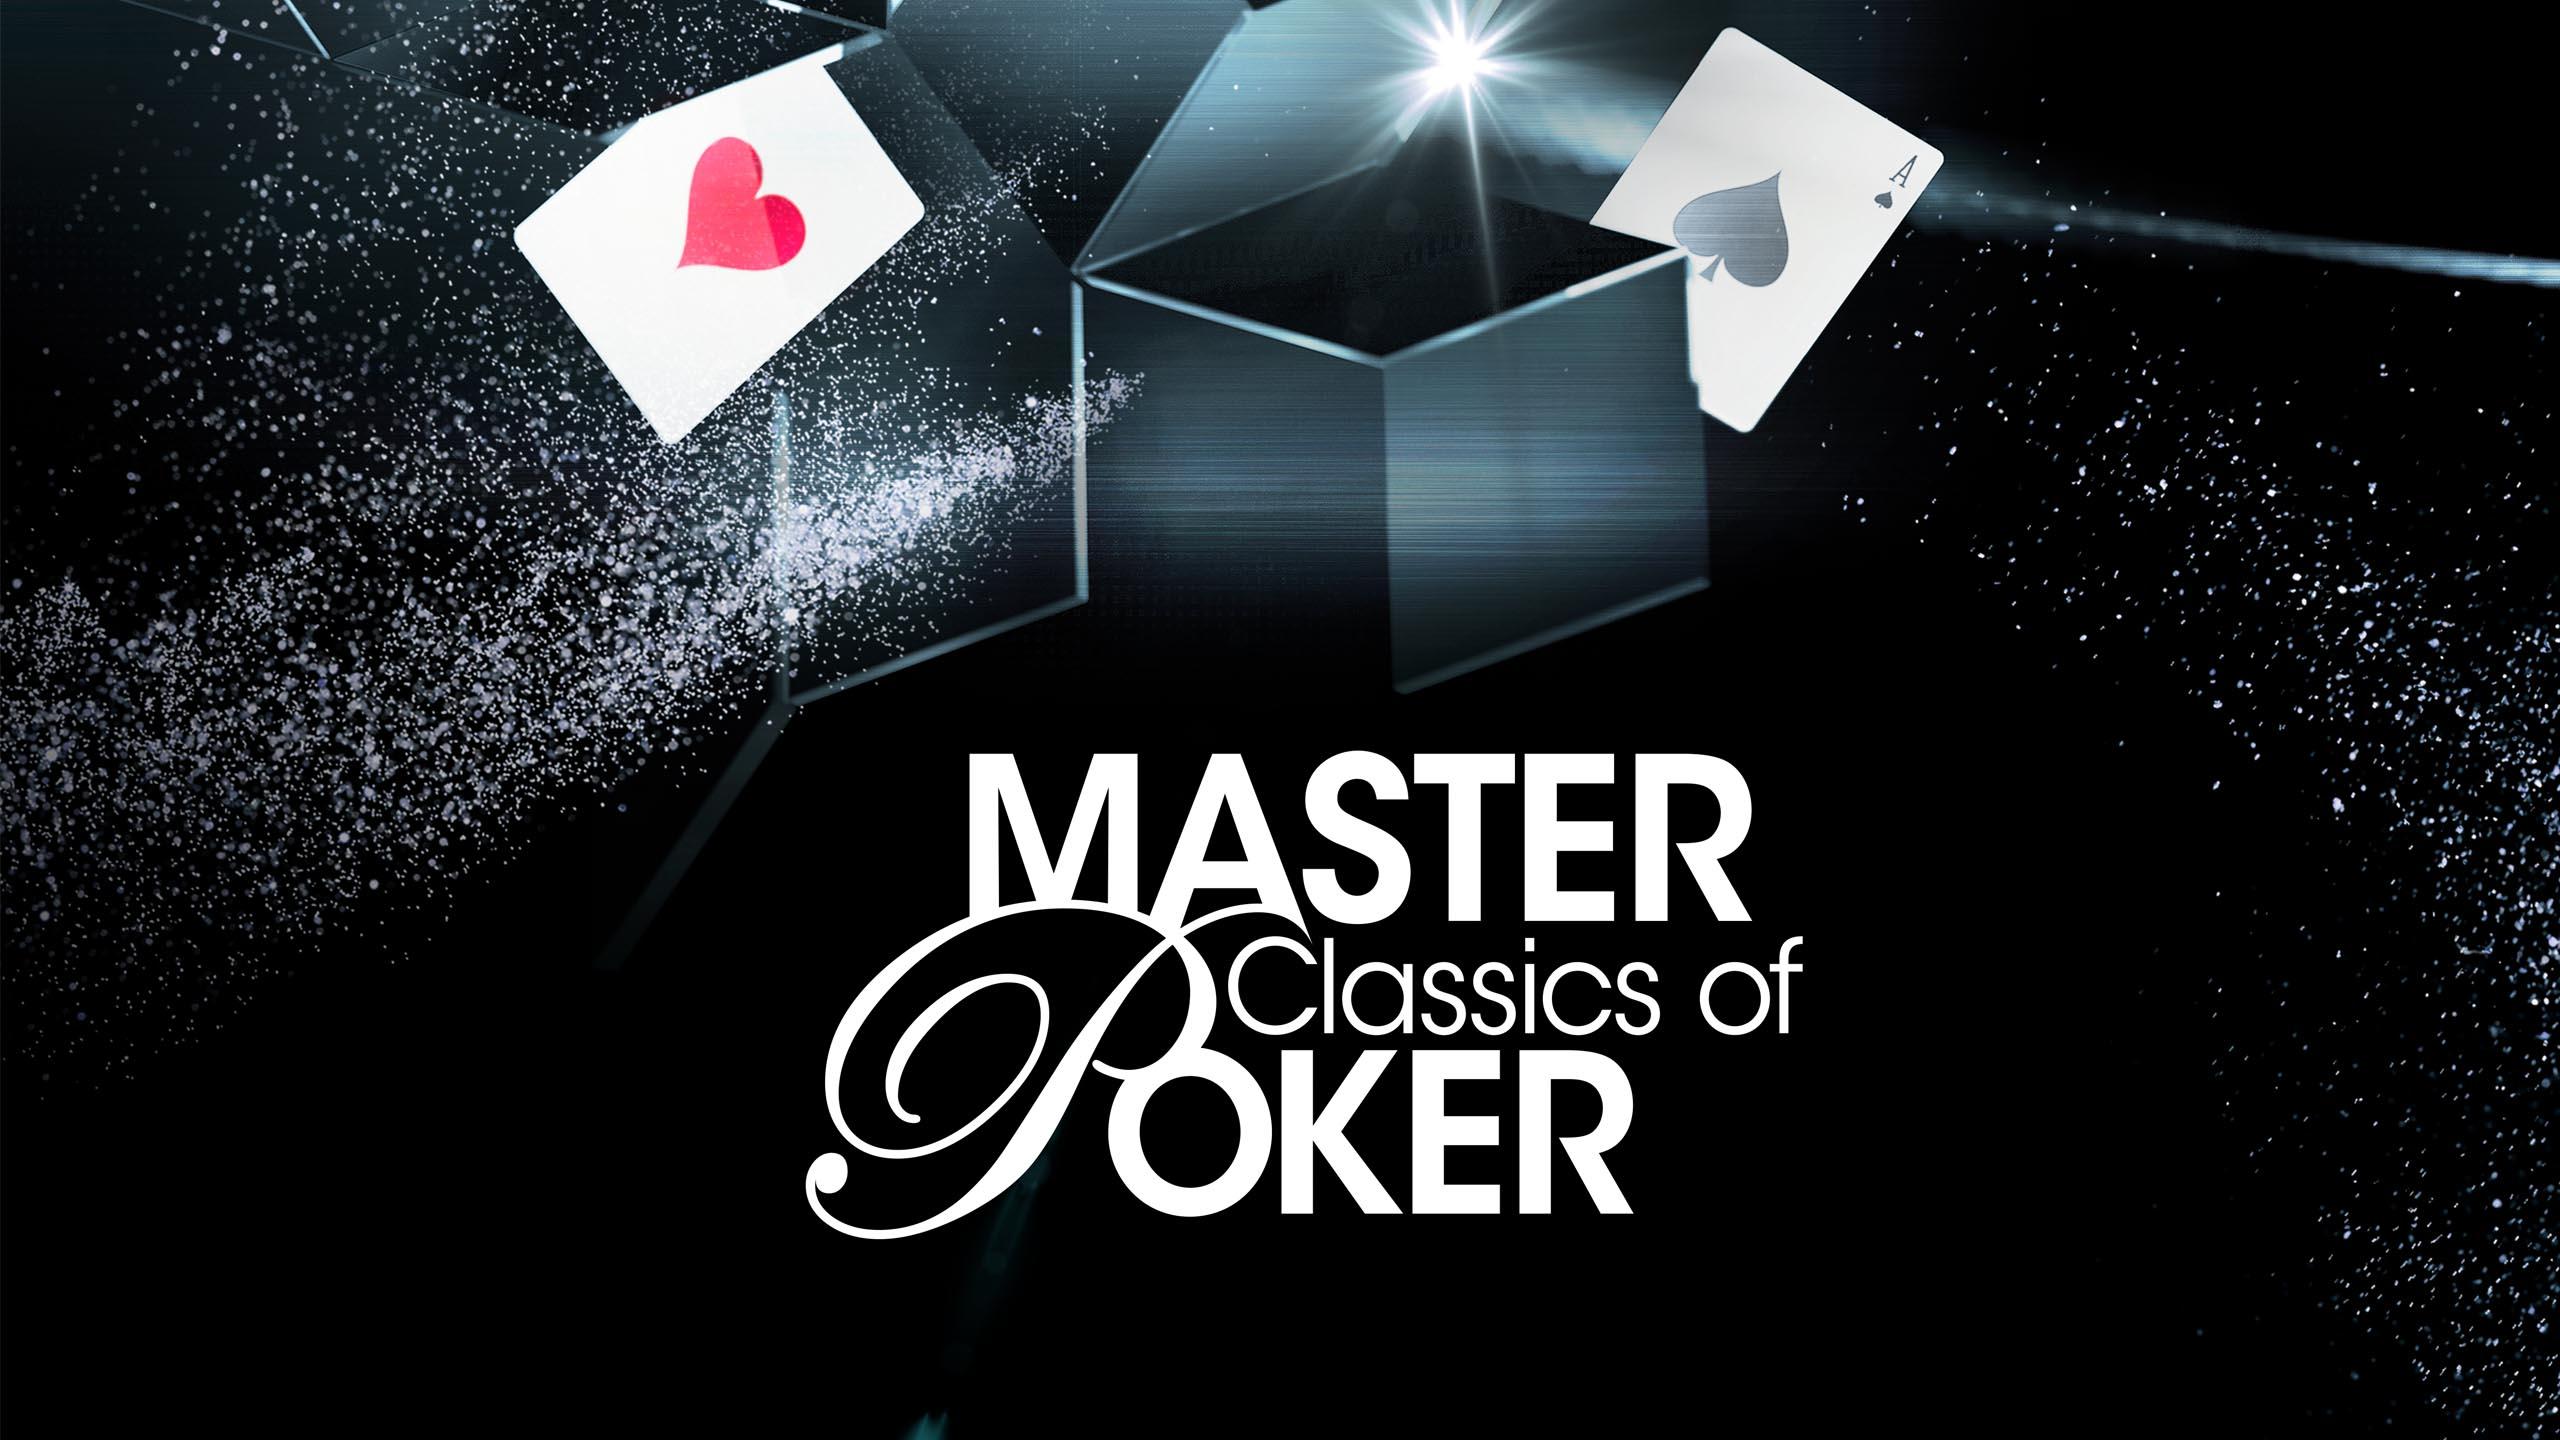 Holland Casino <br> Master Classics of Poker